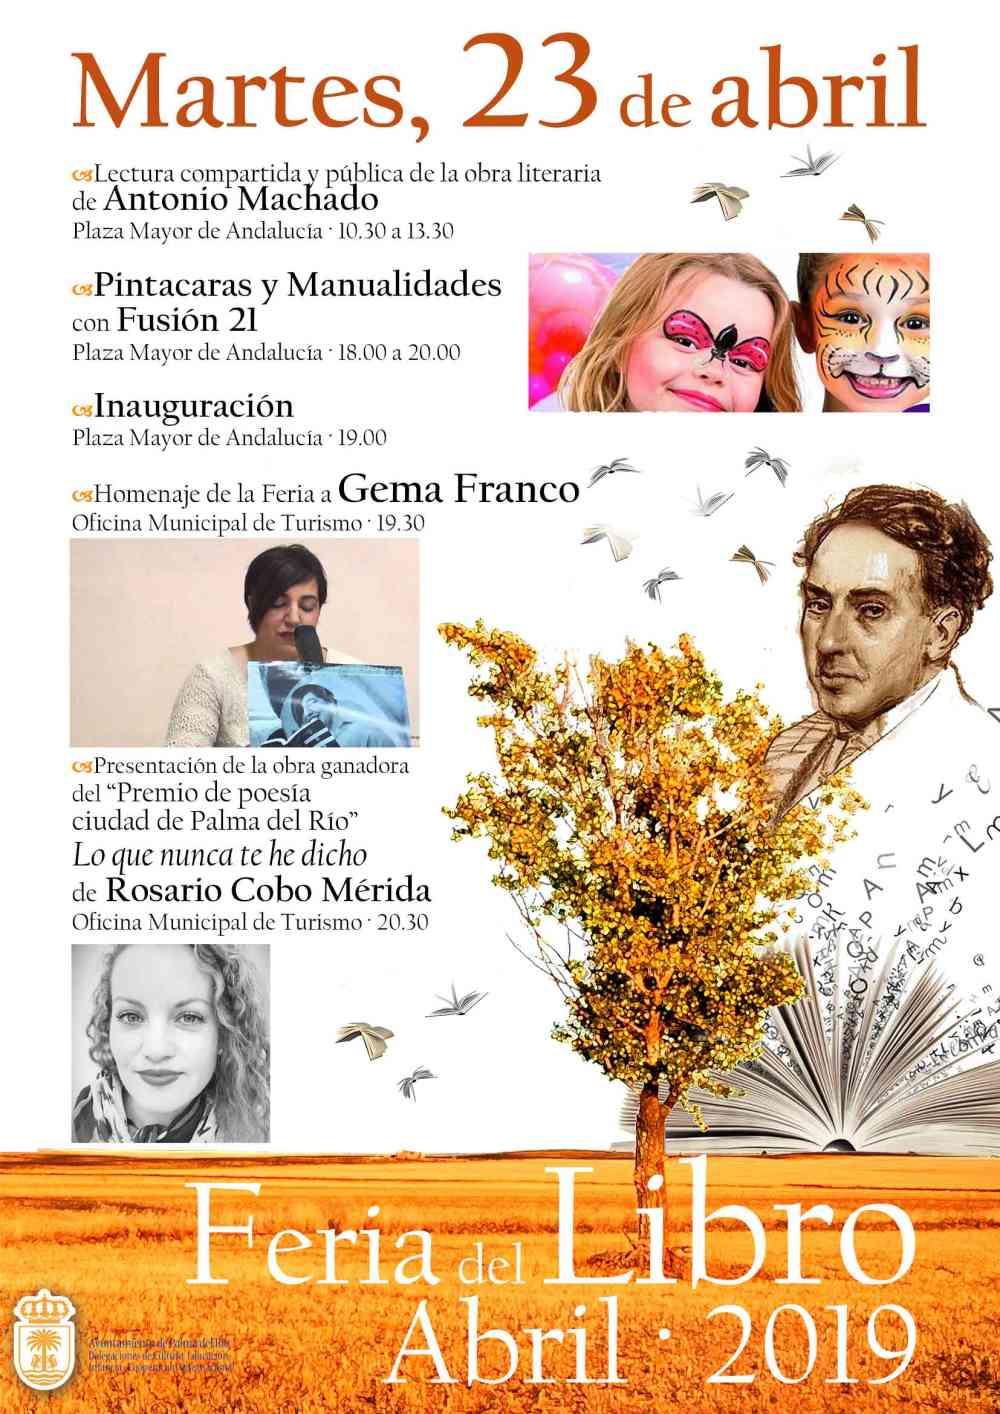 https://www.palmadelrio.es/sites/default/files/web23-feria-libro-martes.jpg